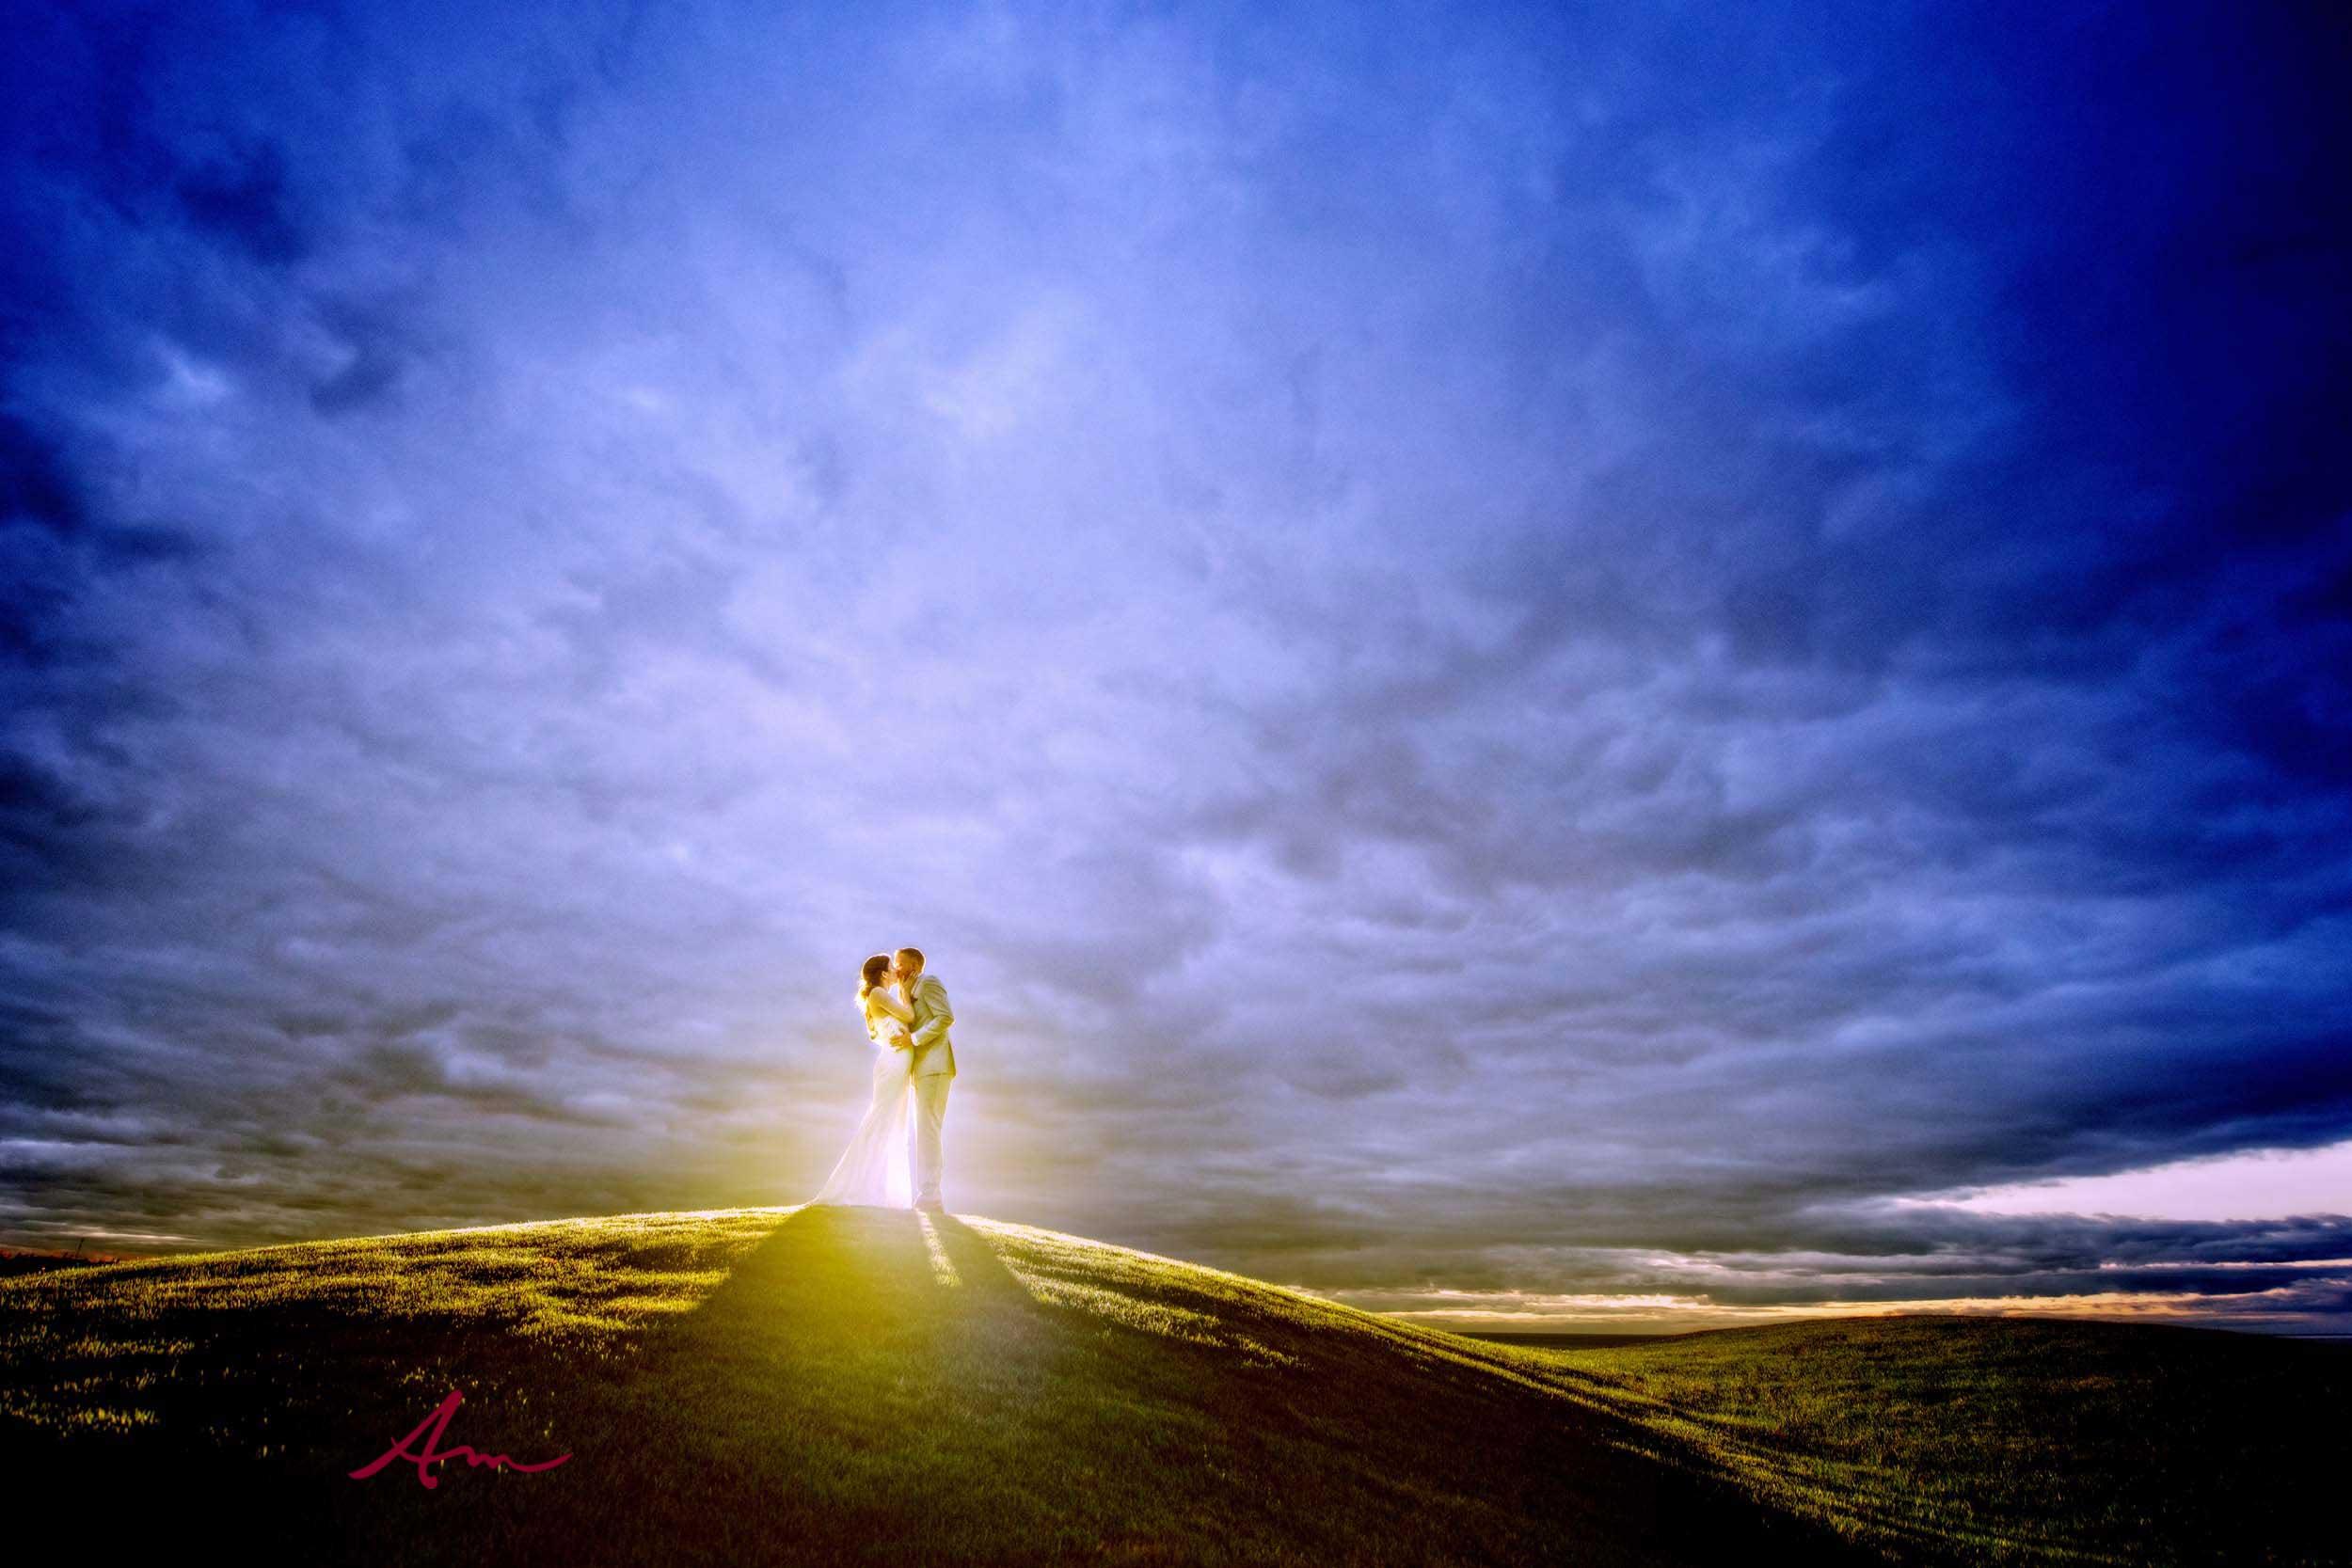 Fox-Harb'r-Wedding-Kiss-Sunset.jpg